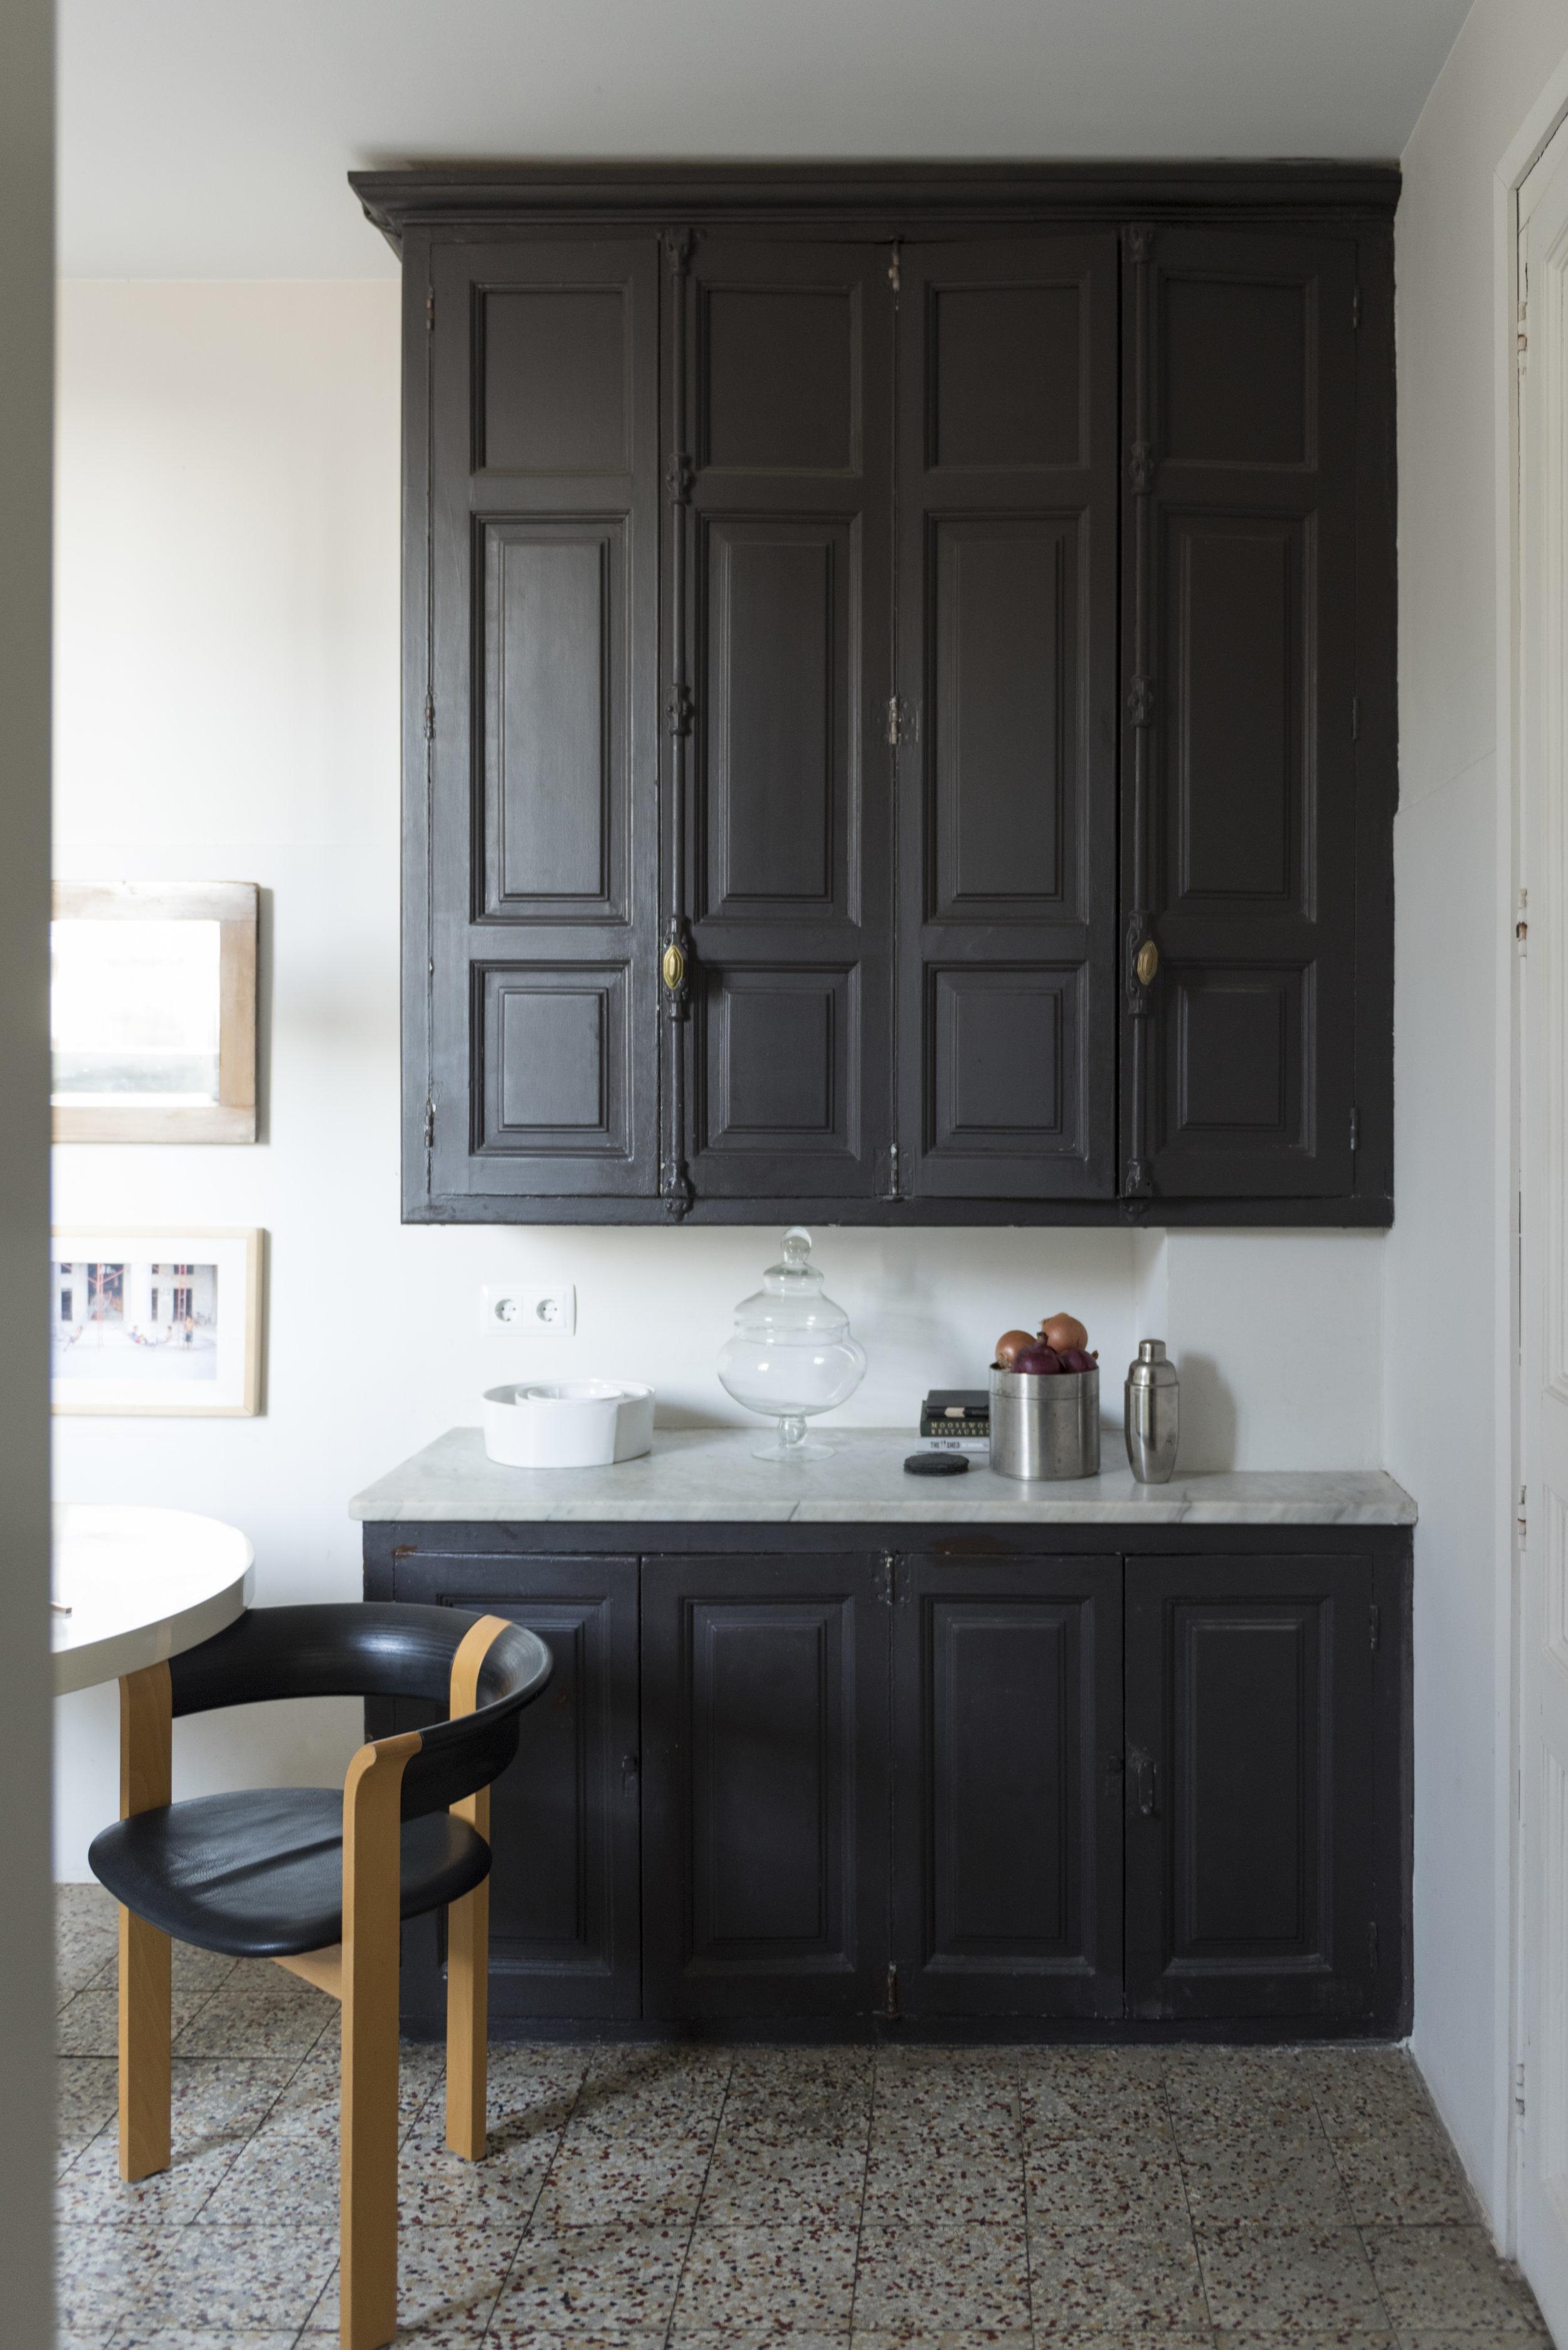 GeorgKayser_architecture_interiordesign_residencial_grandegracia_15.jpg